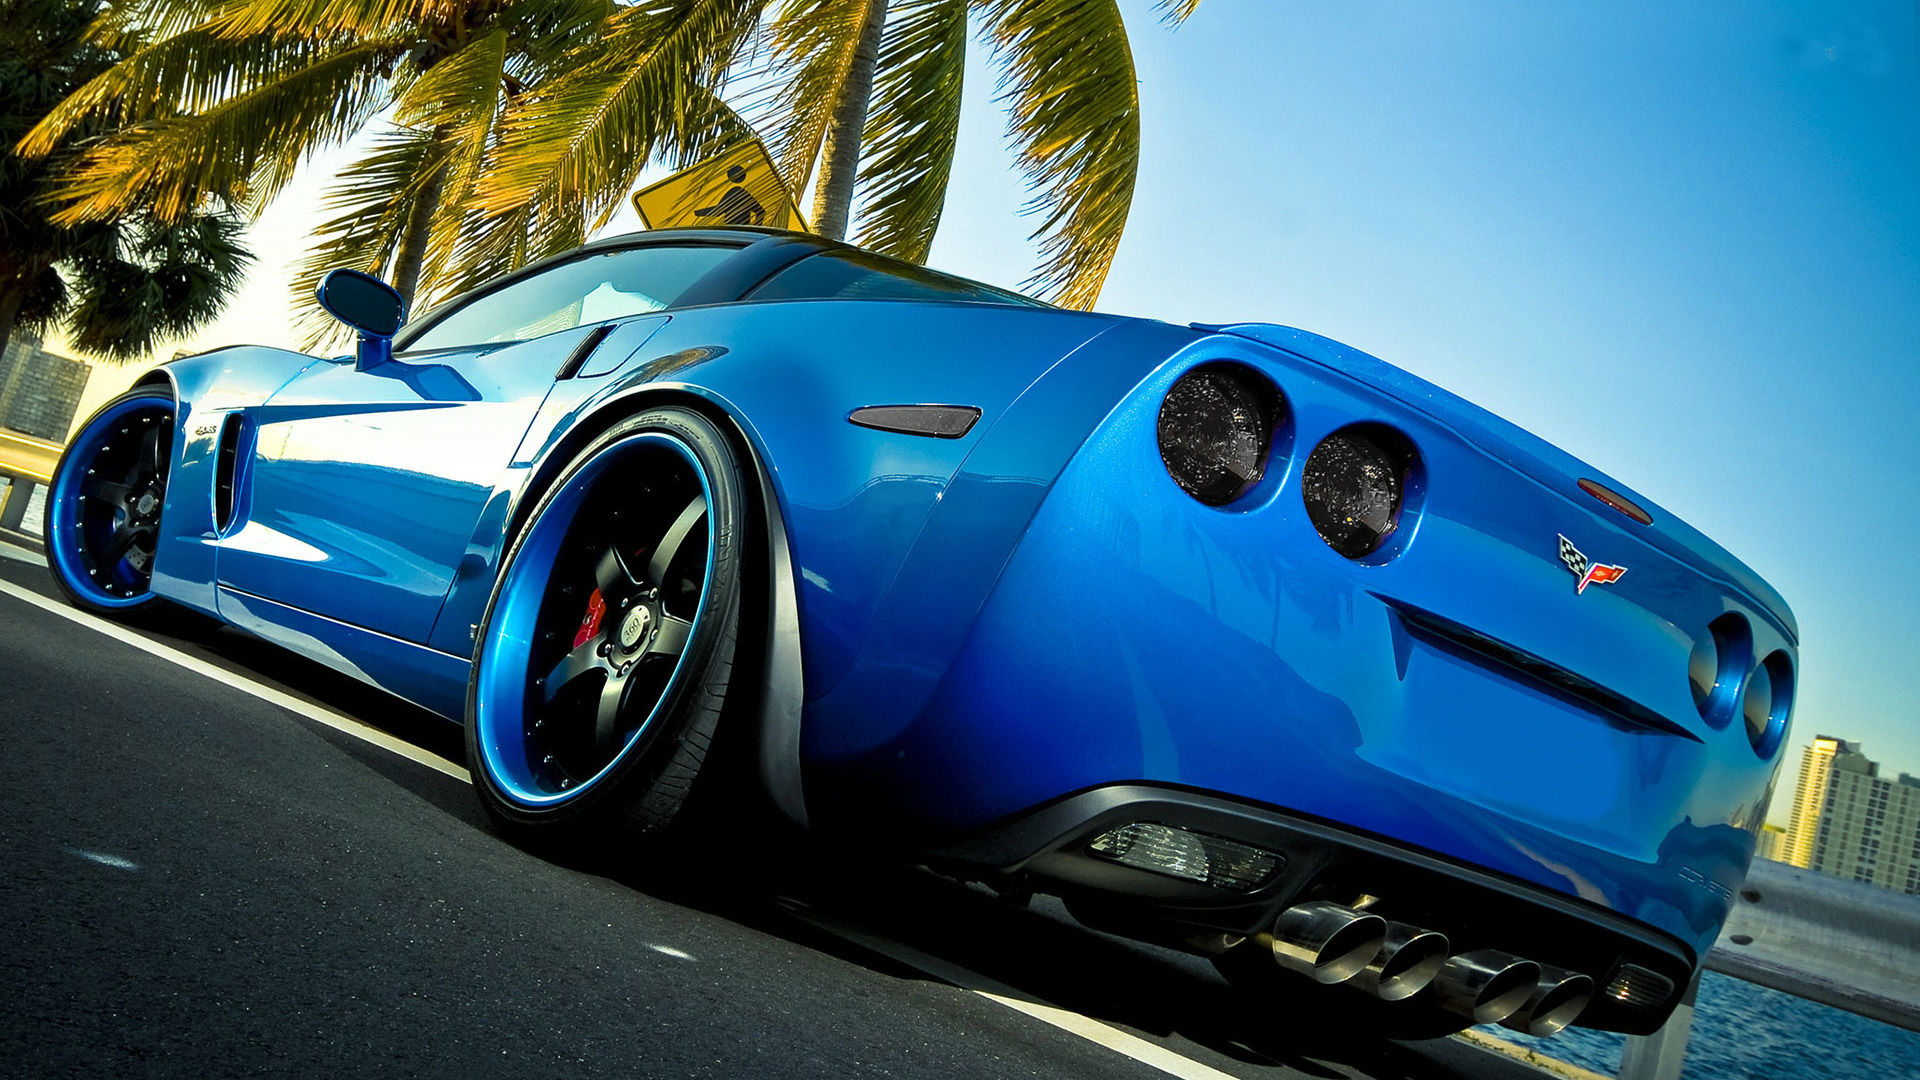 16049-forged-chevrolet-corvette-1920x1080-car-wallpaper